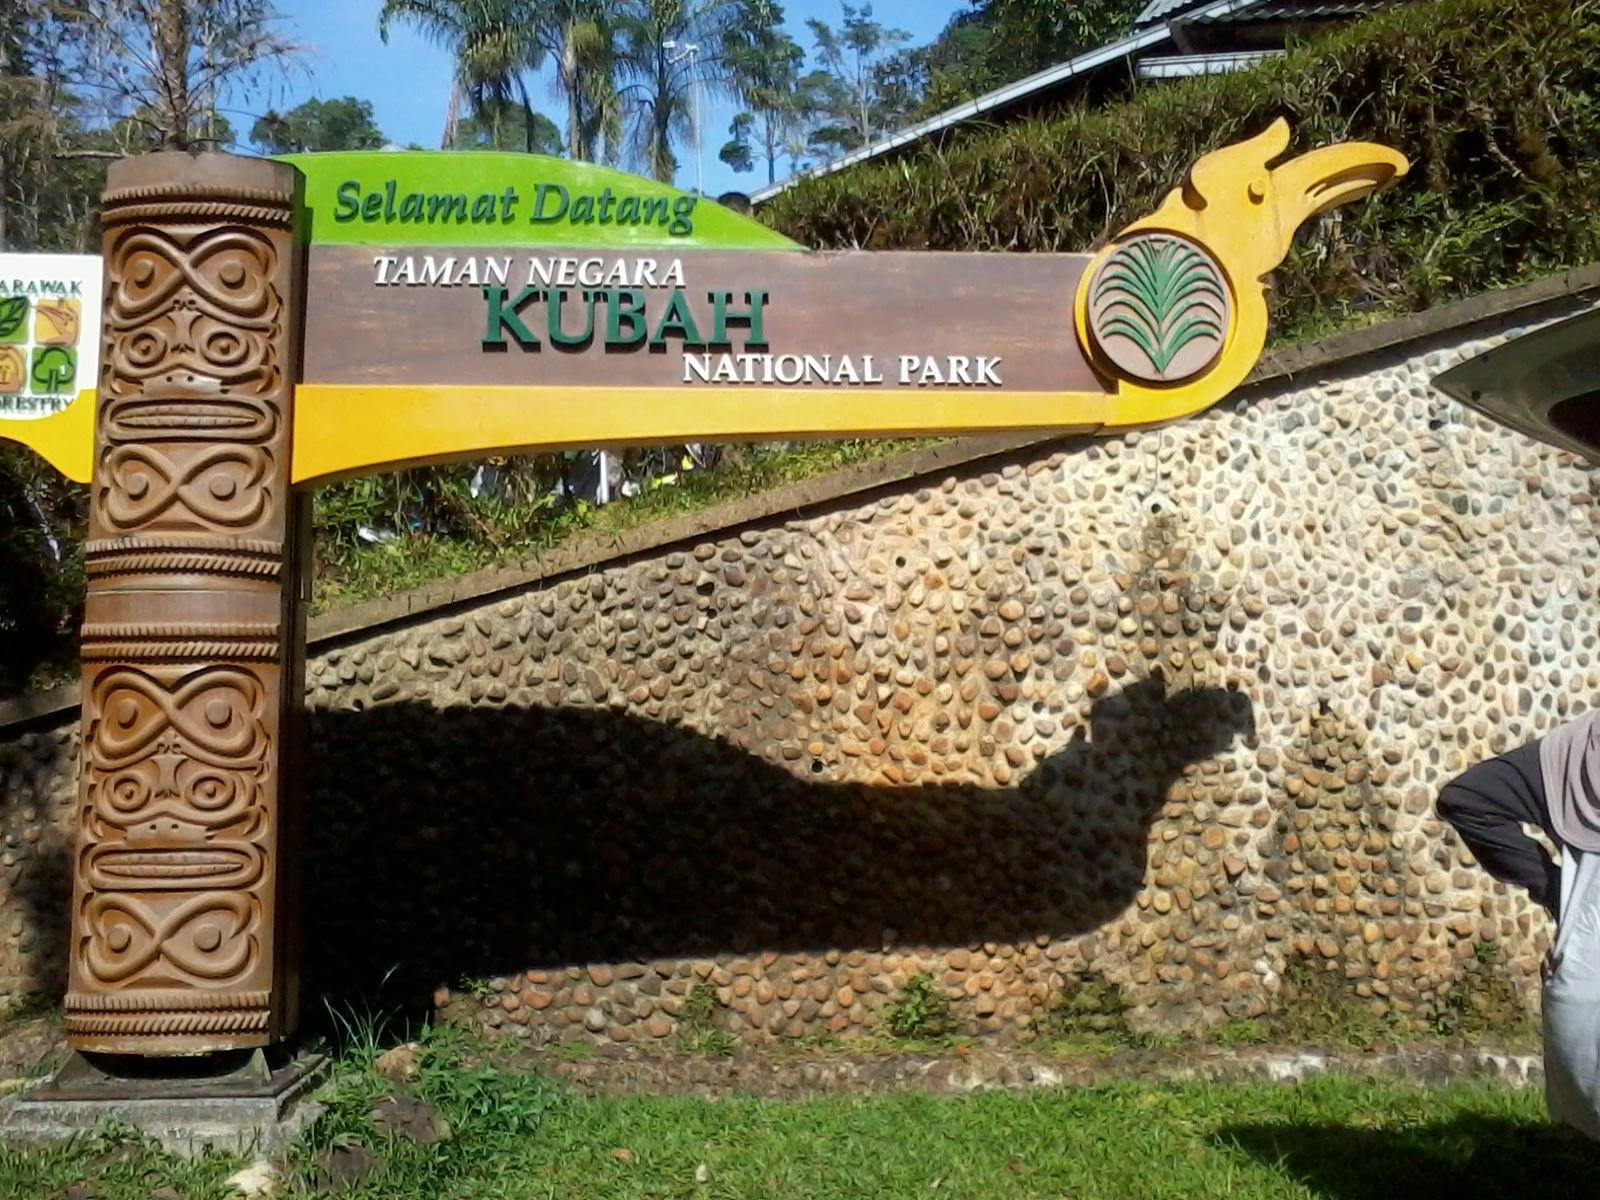 Fieldtrip To Kubah National Park Asasi Sains Hayat Universiti Malaysia Sarawak